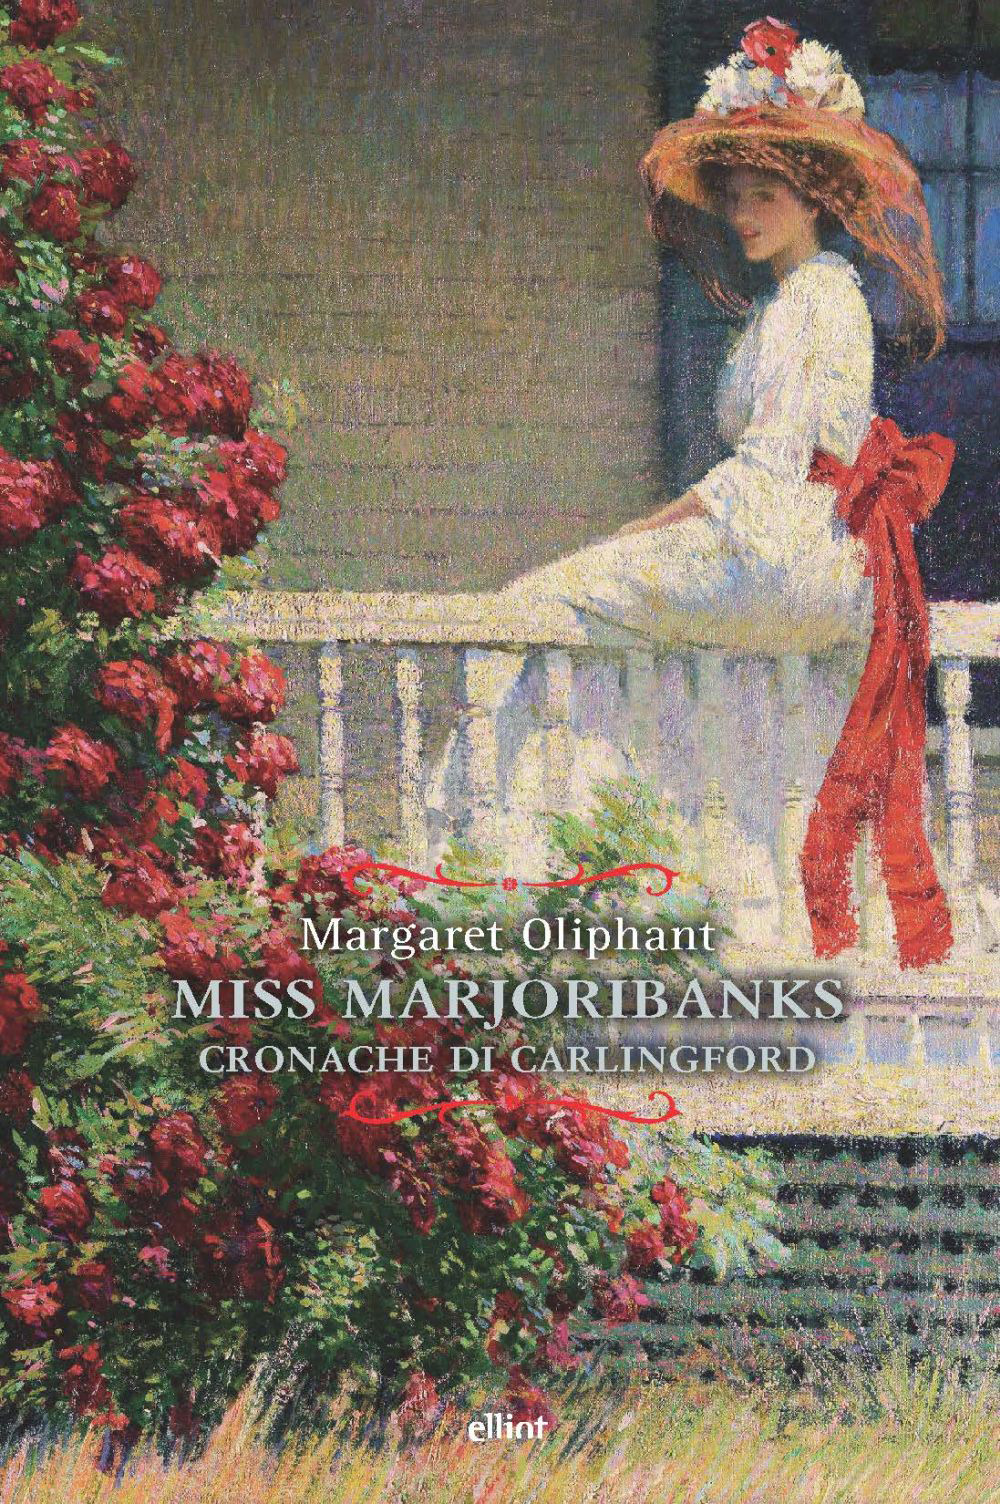 MISS MARJORIBANKS. CRONACHE DI CARLINGFORD - Oliphant Margaret - 9788892760288